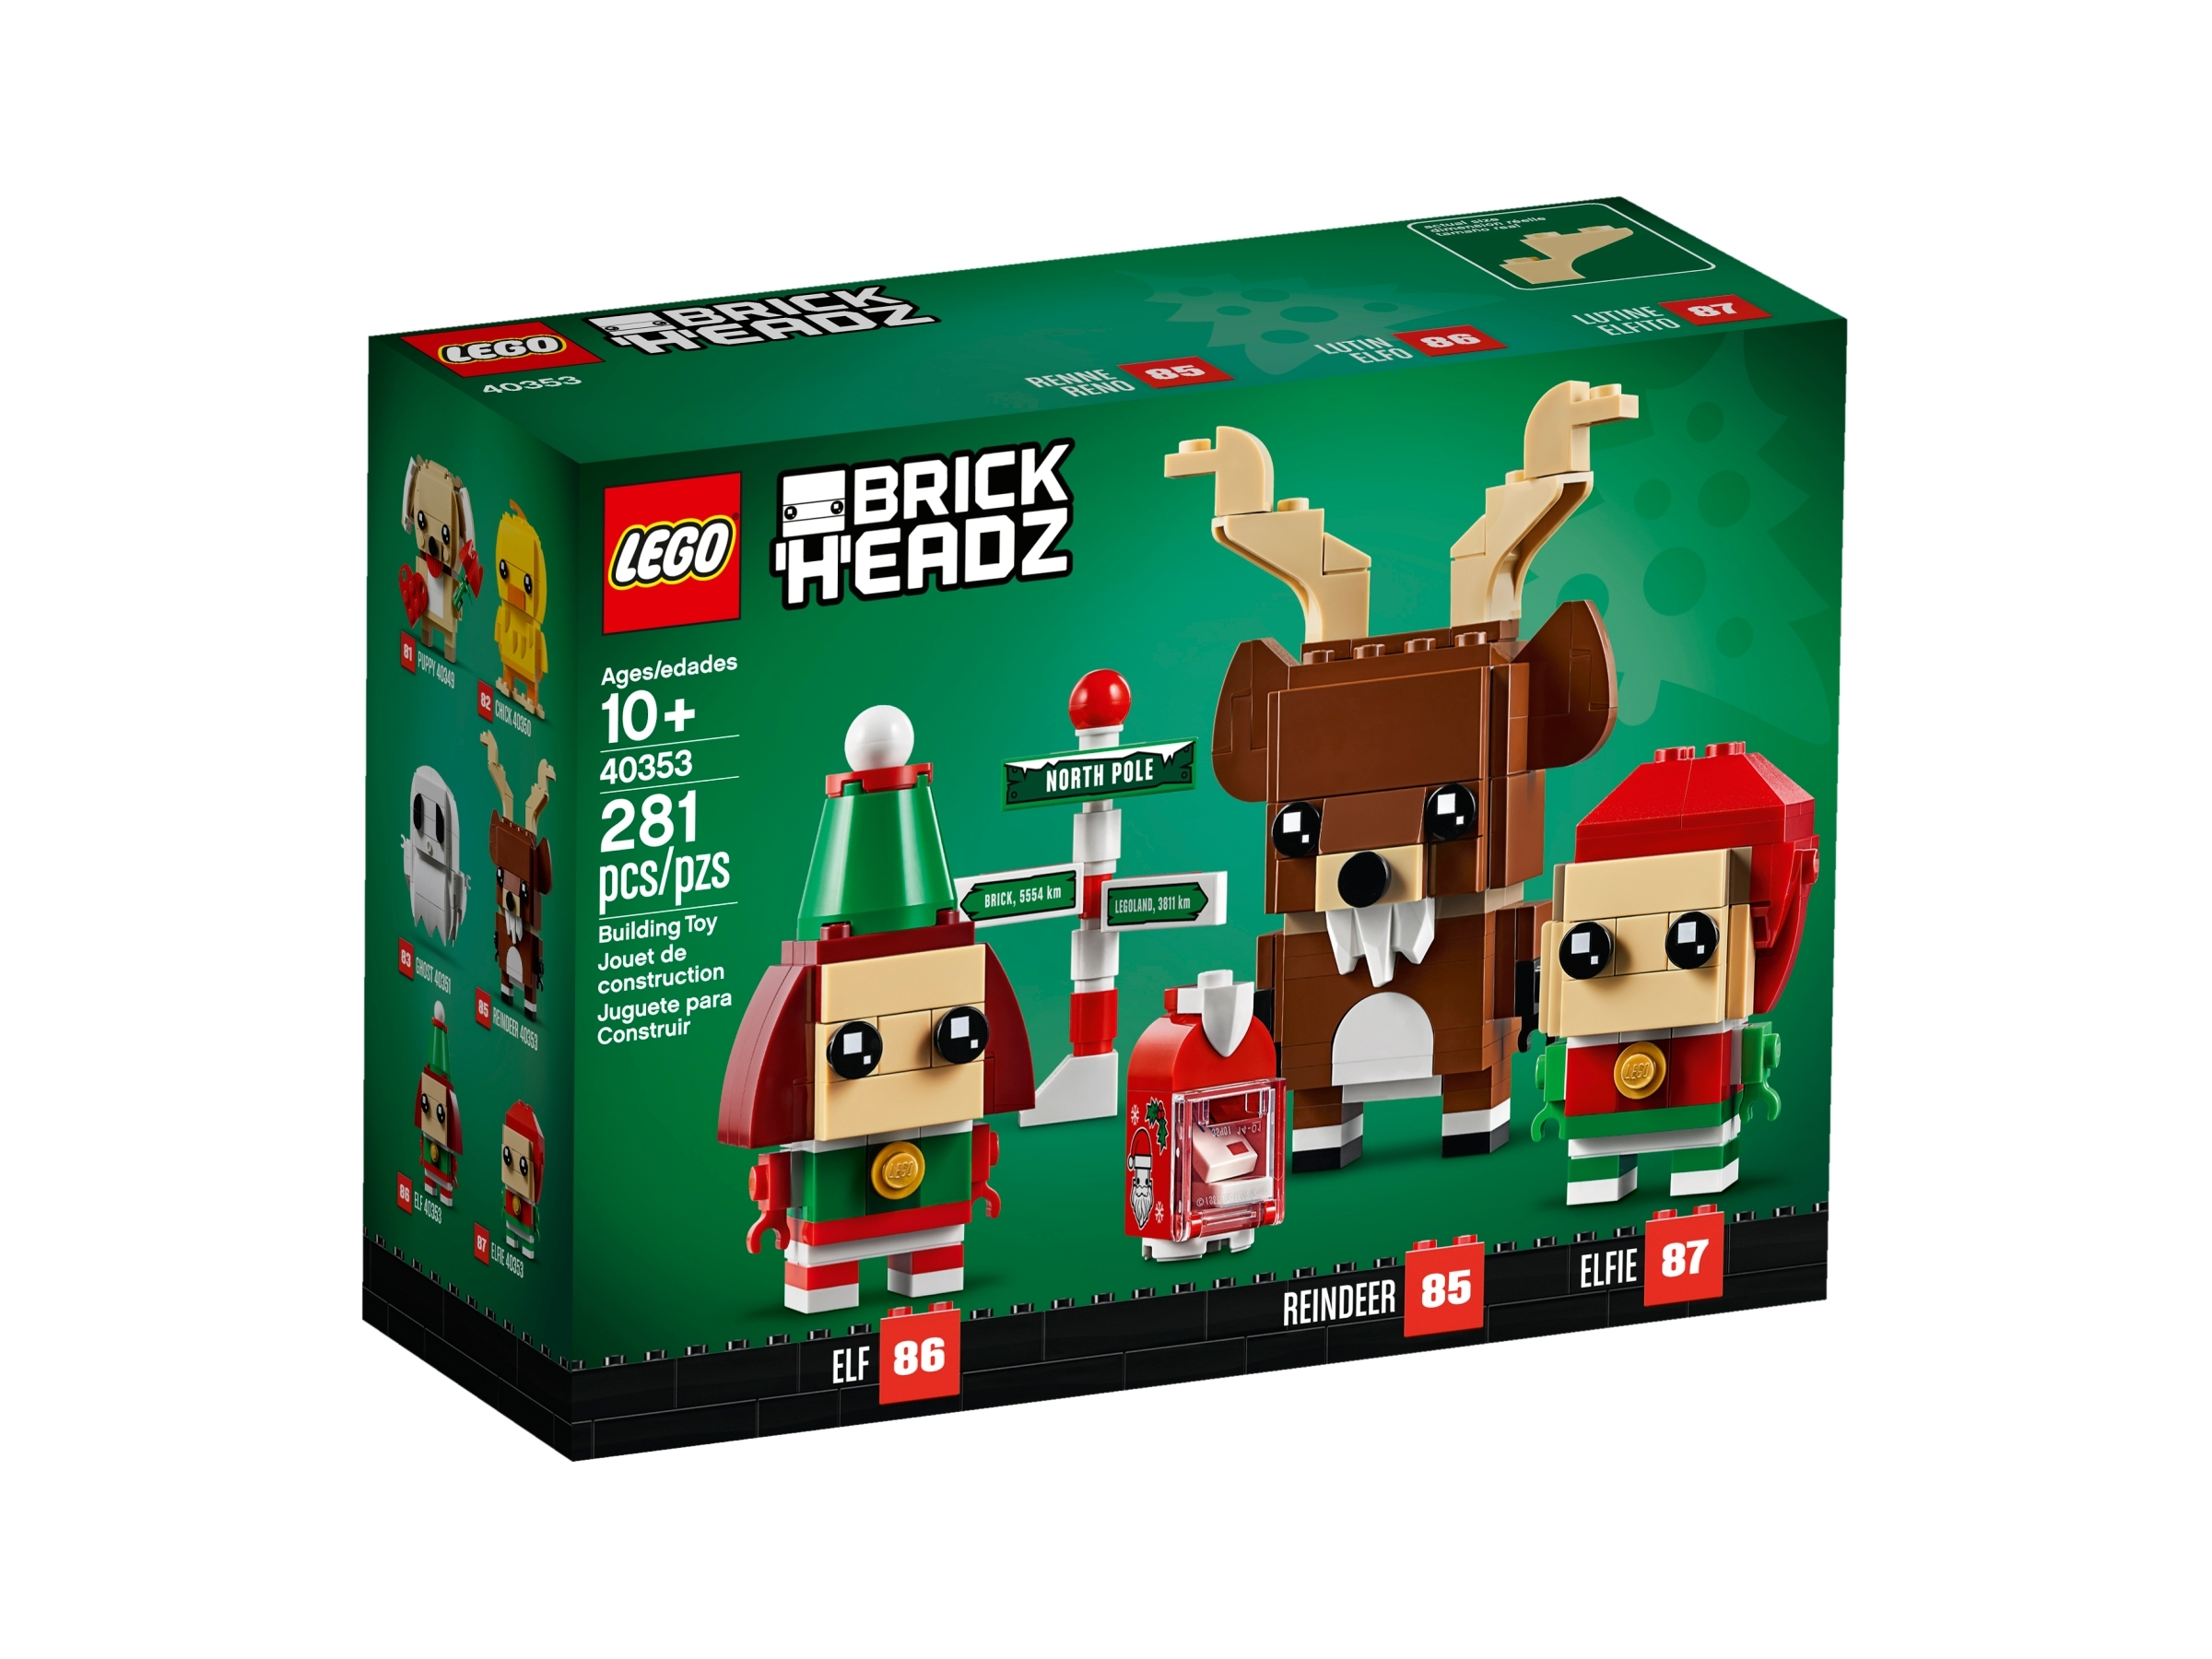 LEGO BrickHeadz 40353 Ren och tomtenissar